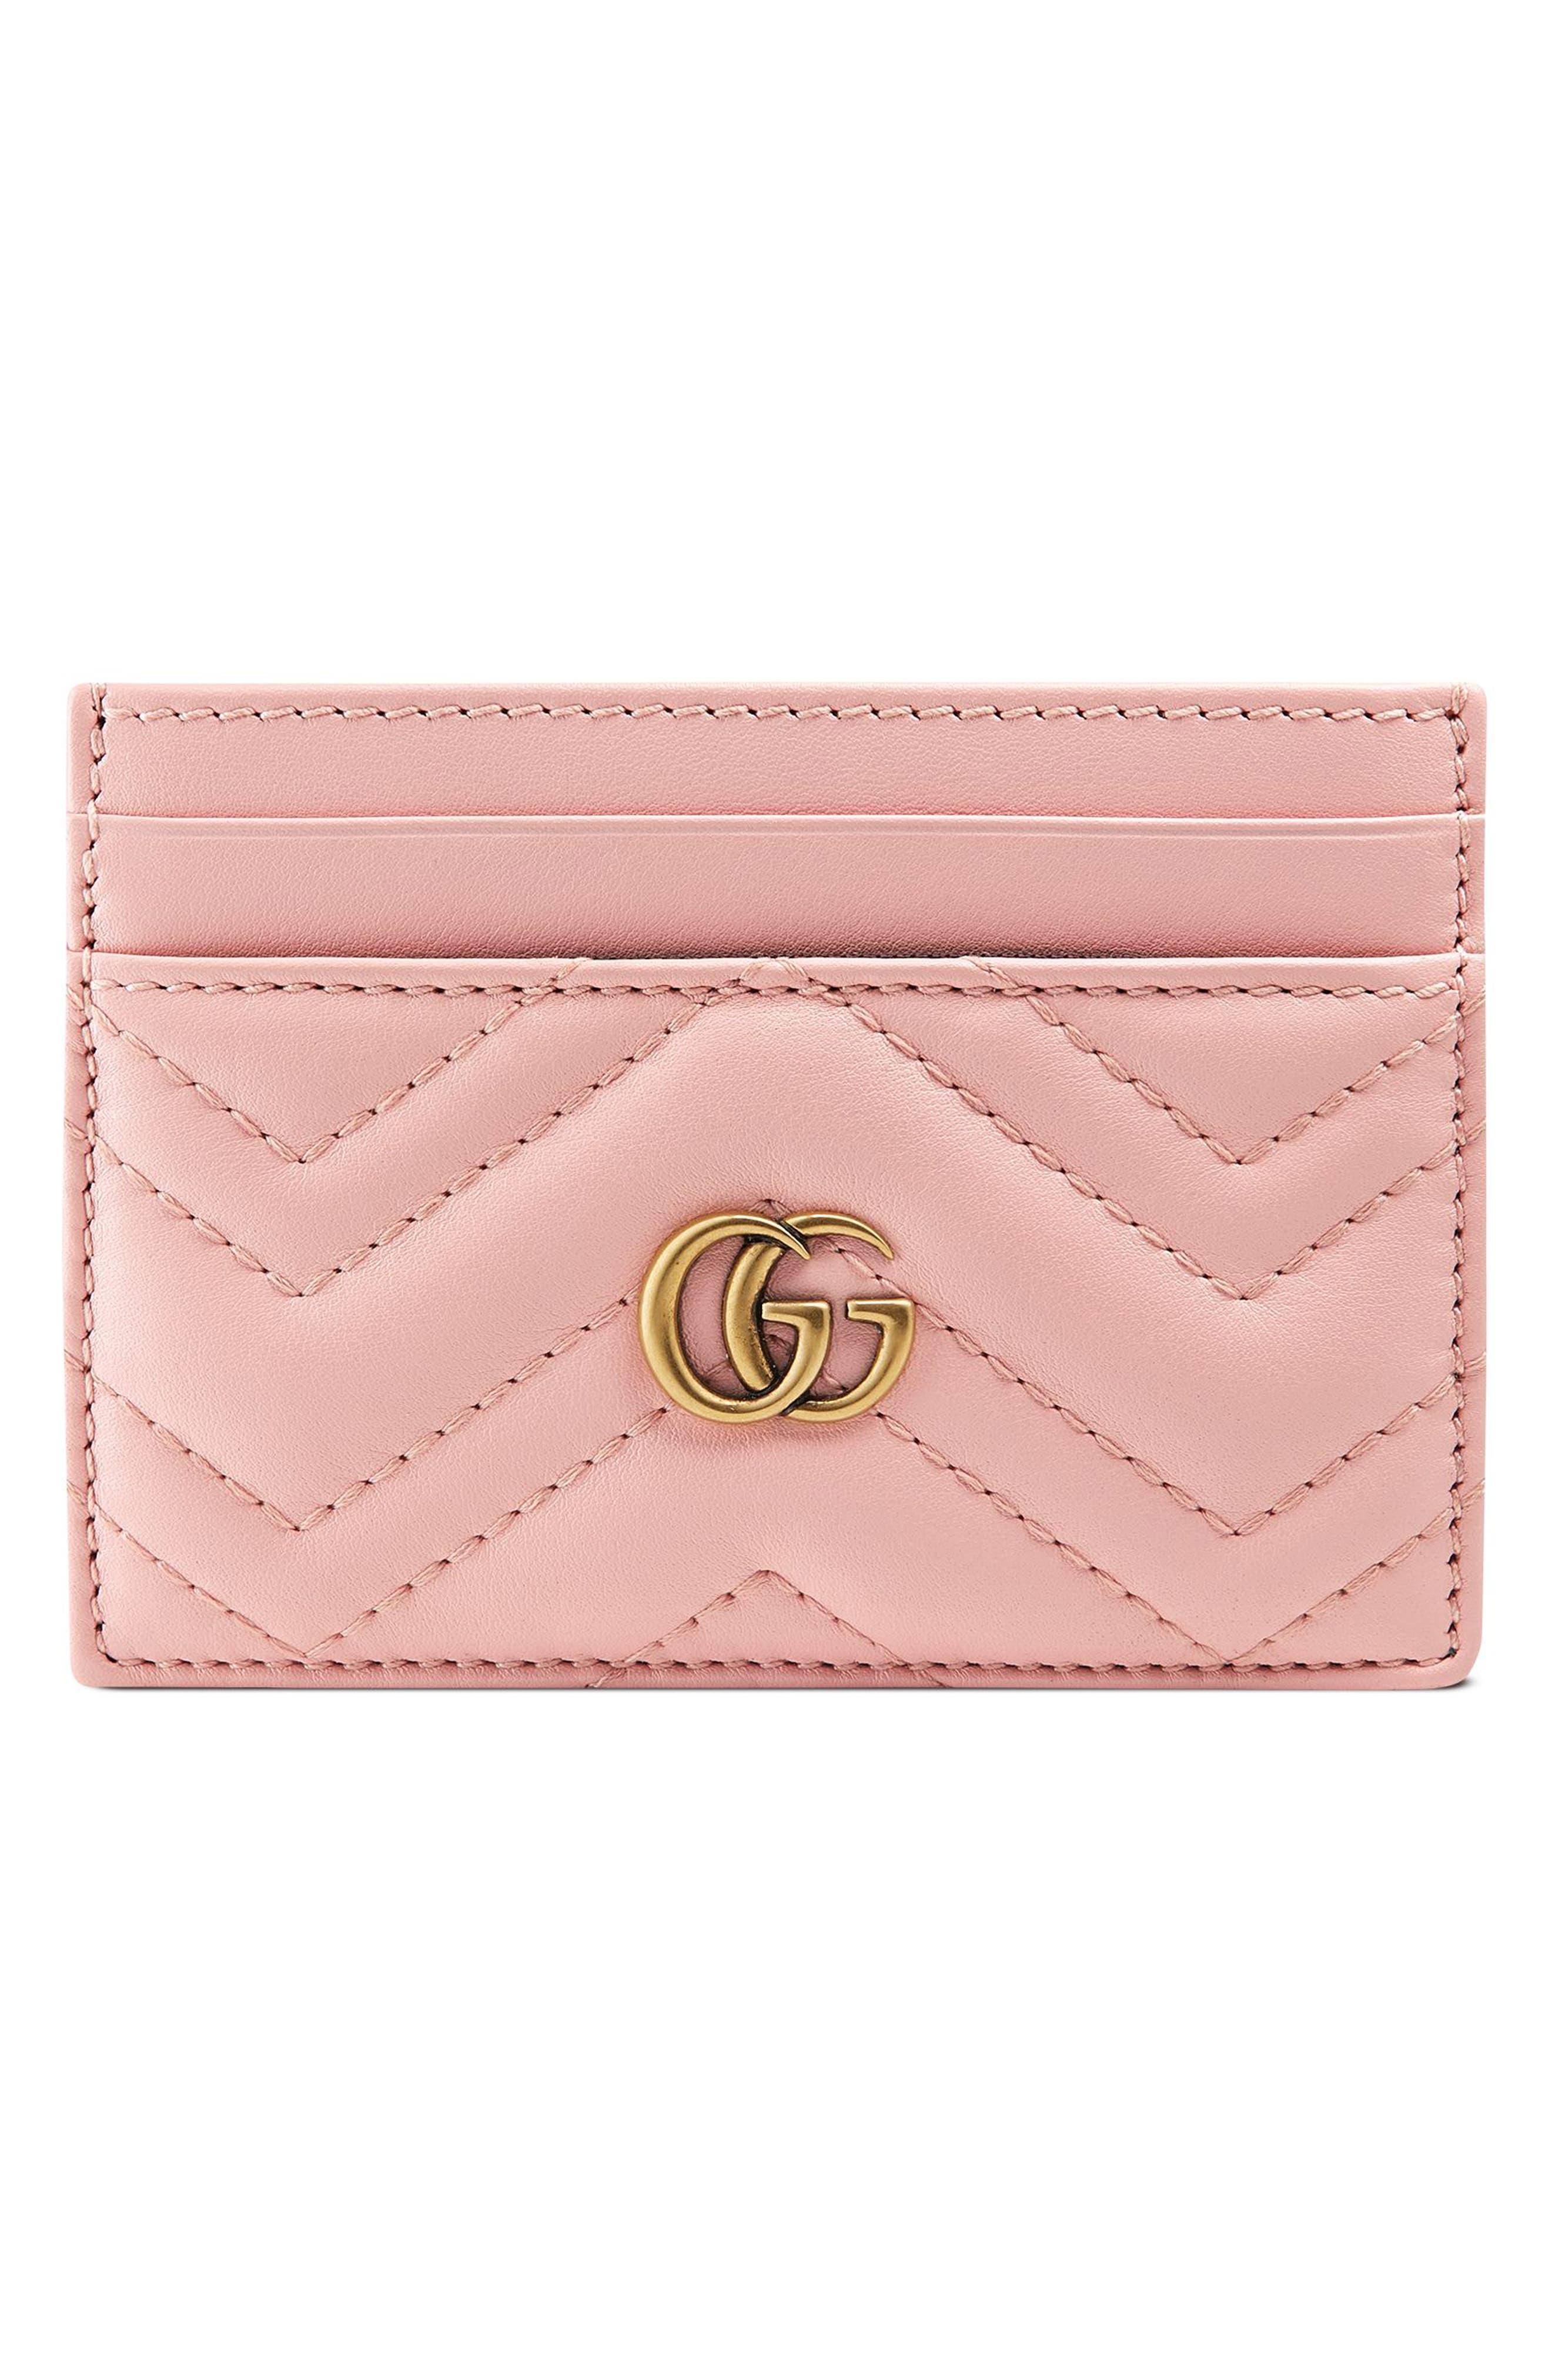 GG Marmont Matelassé Leather Card Case, Main, color, PERFECT PINK